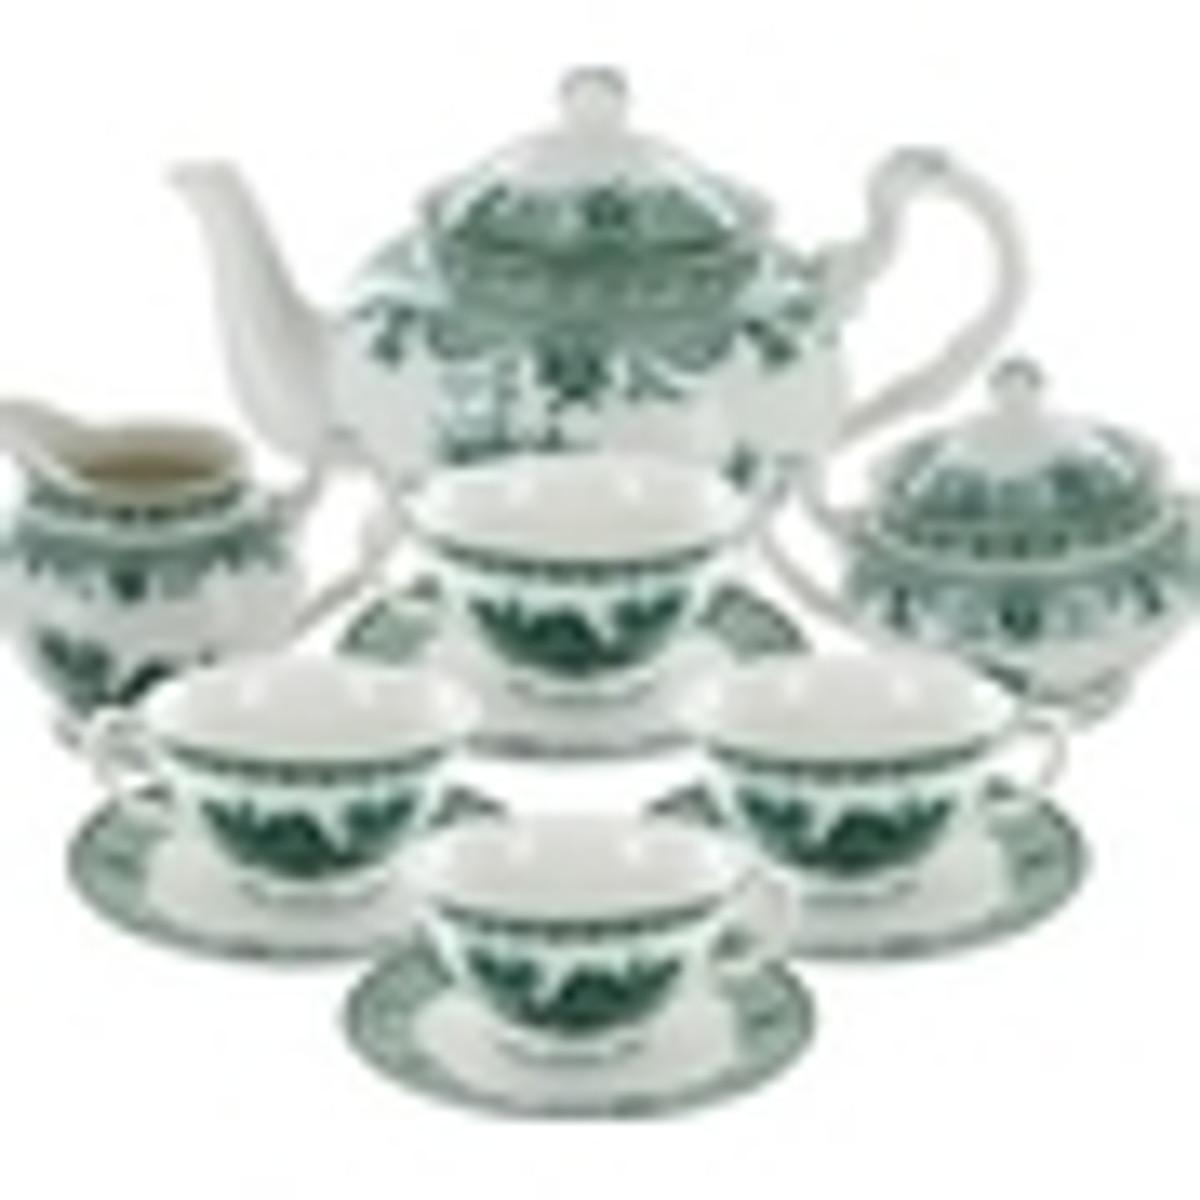 Green Toile Porcelain